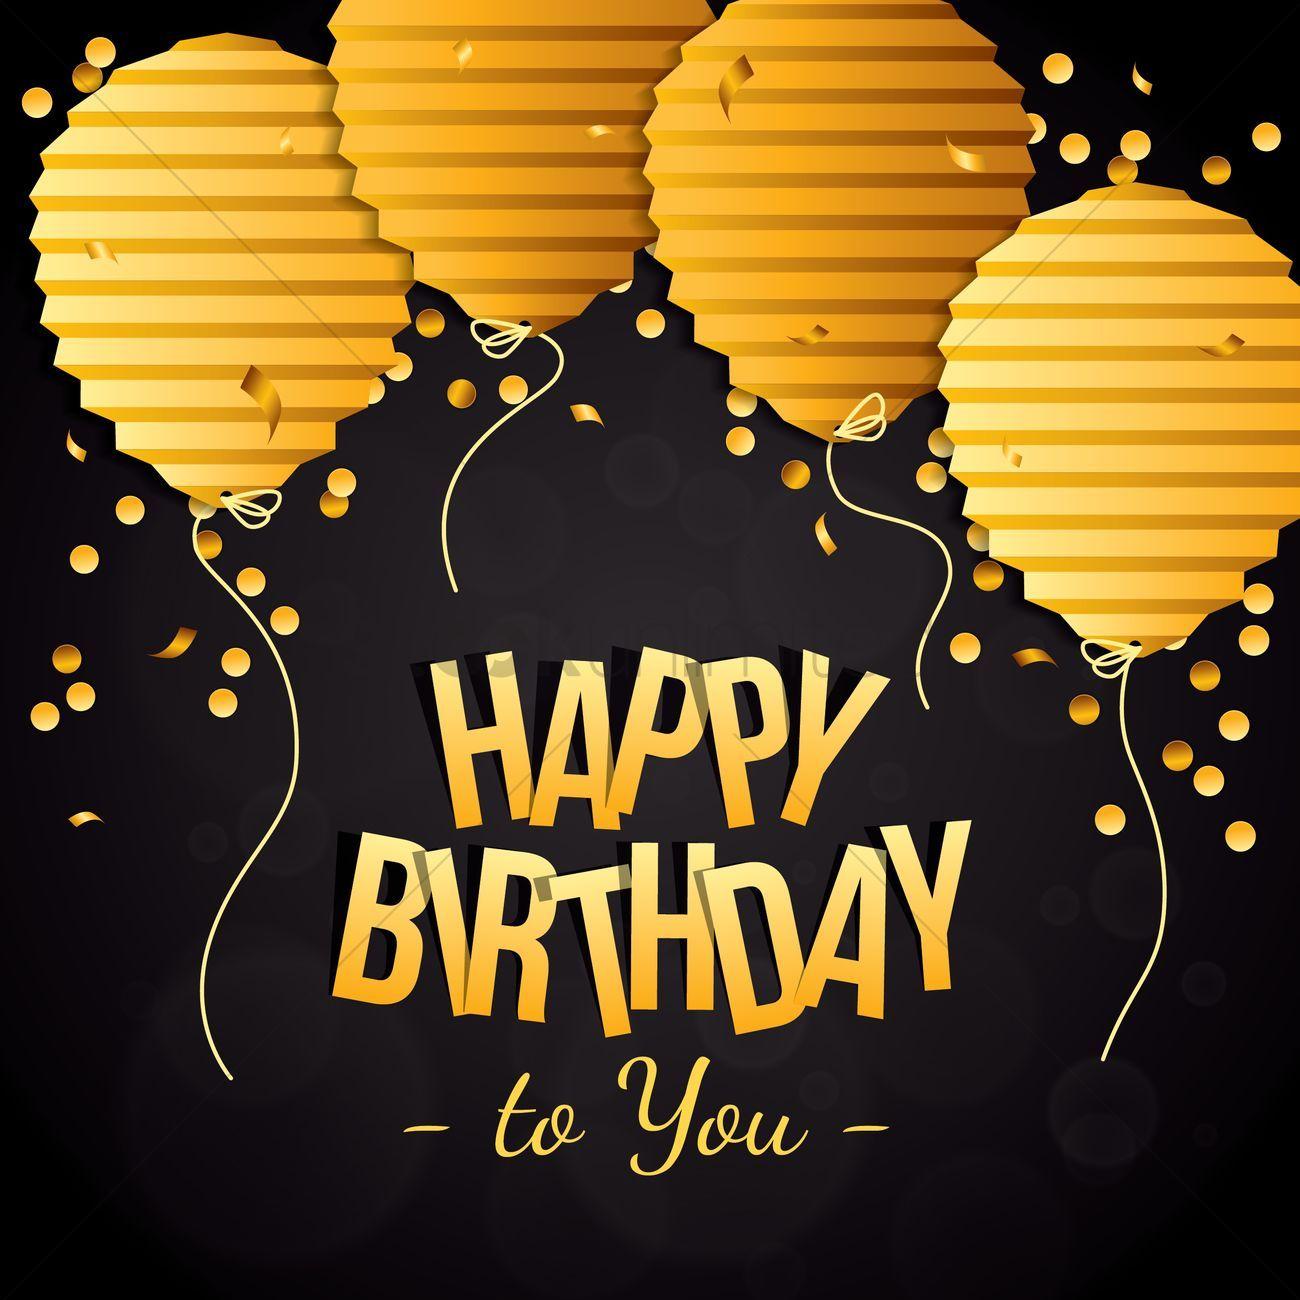 Pin by Cindy Jones on Birthday Wishes Happy birthday